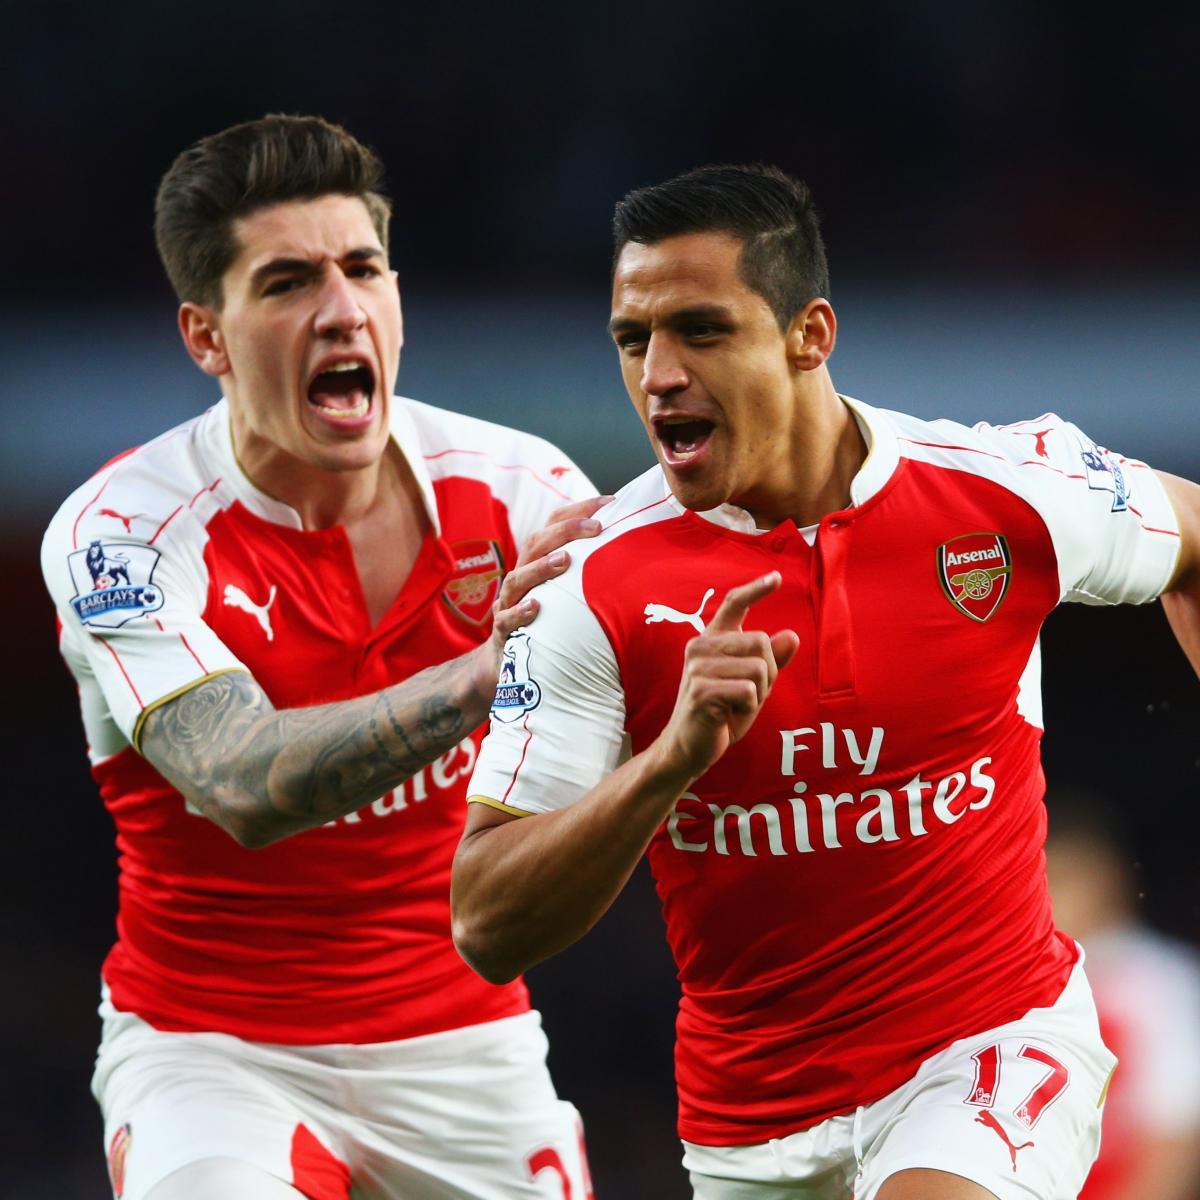 Manchester United Transfer News Alexis Sanchez Rumours: Arsenal Transfer News: Alexis Sanchez Rumours Fuelled